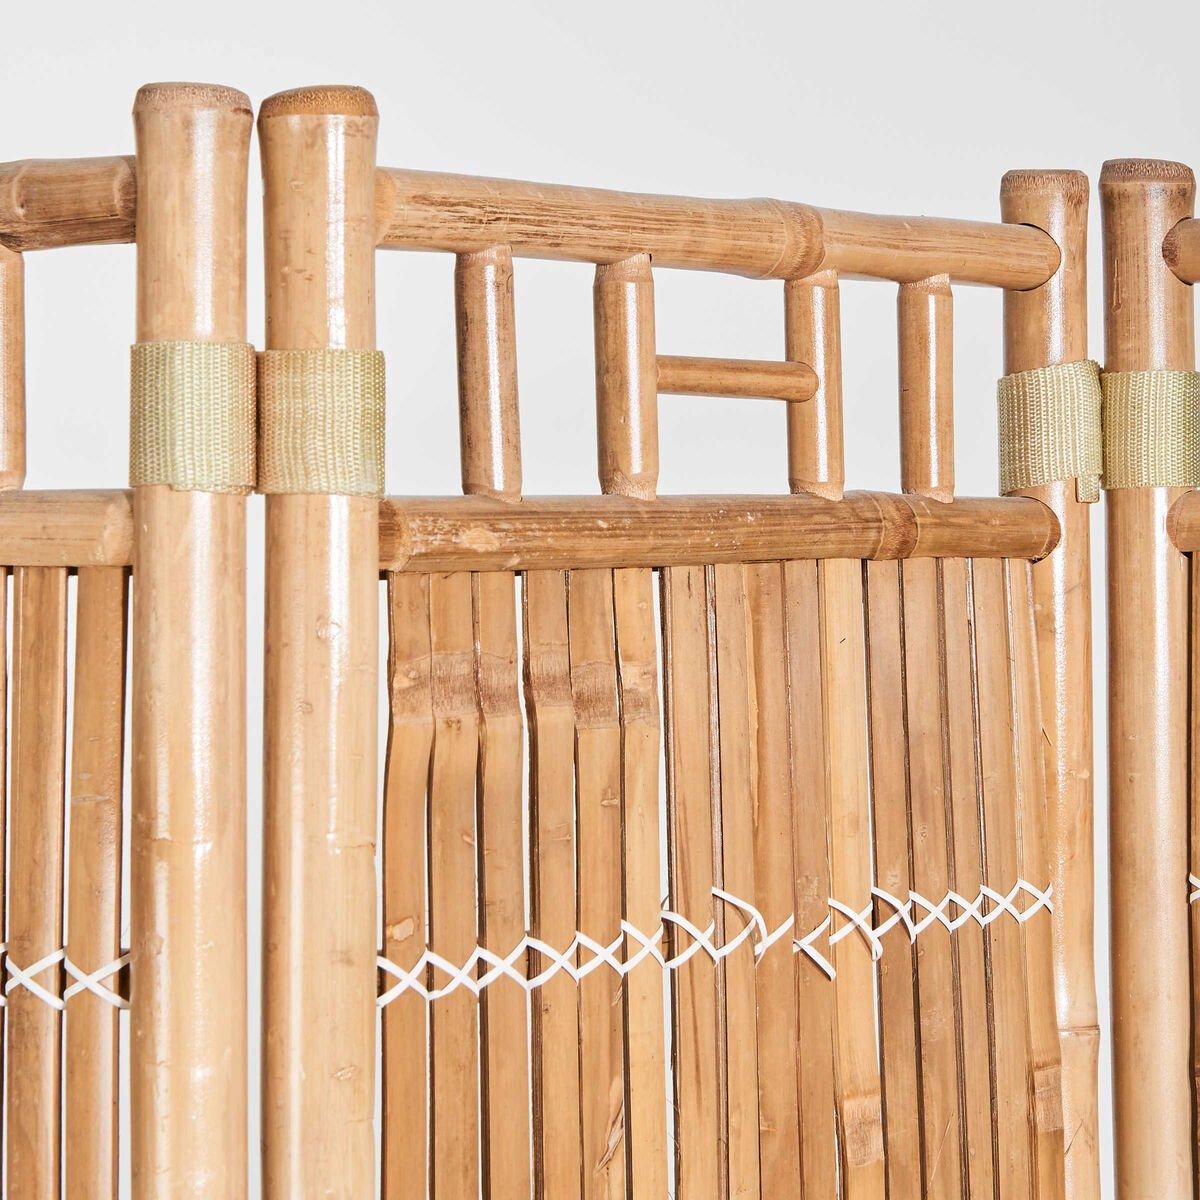 Full Size of Safari Paravent Aus Bambus 120 180 Cm Butlers Garten Bett Wohnzimmer Paravent Bambus